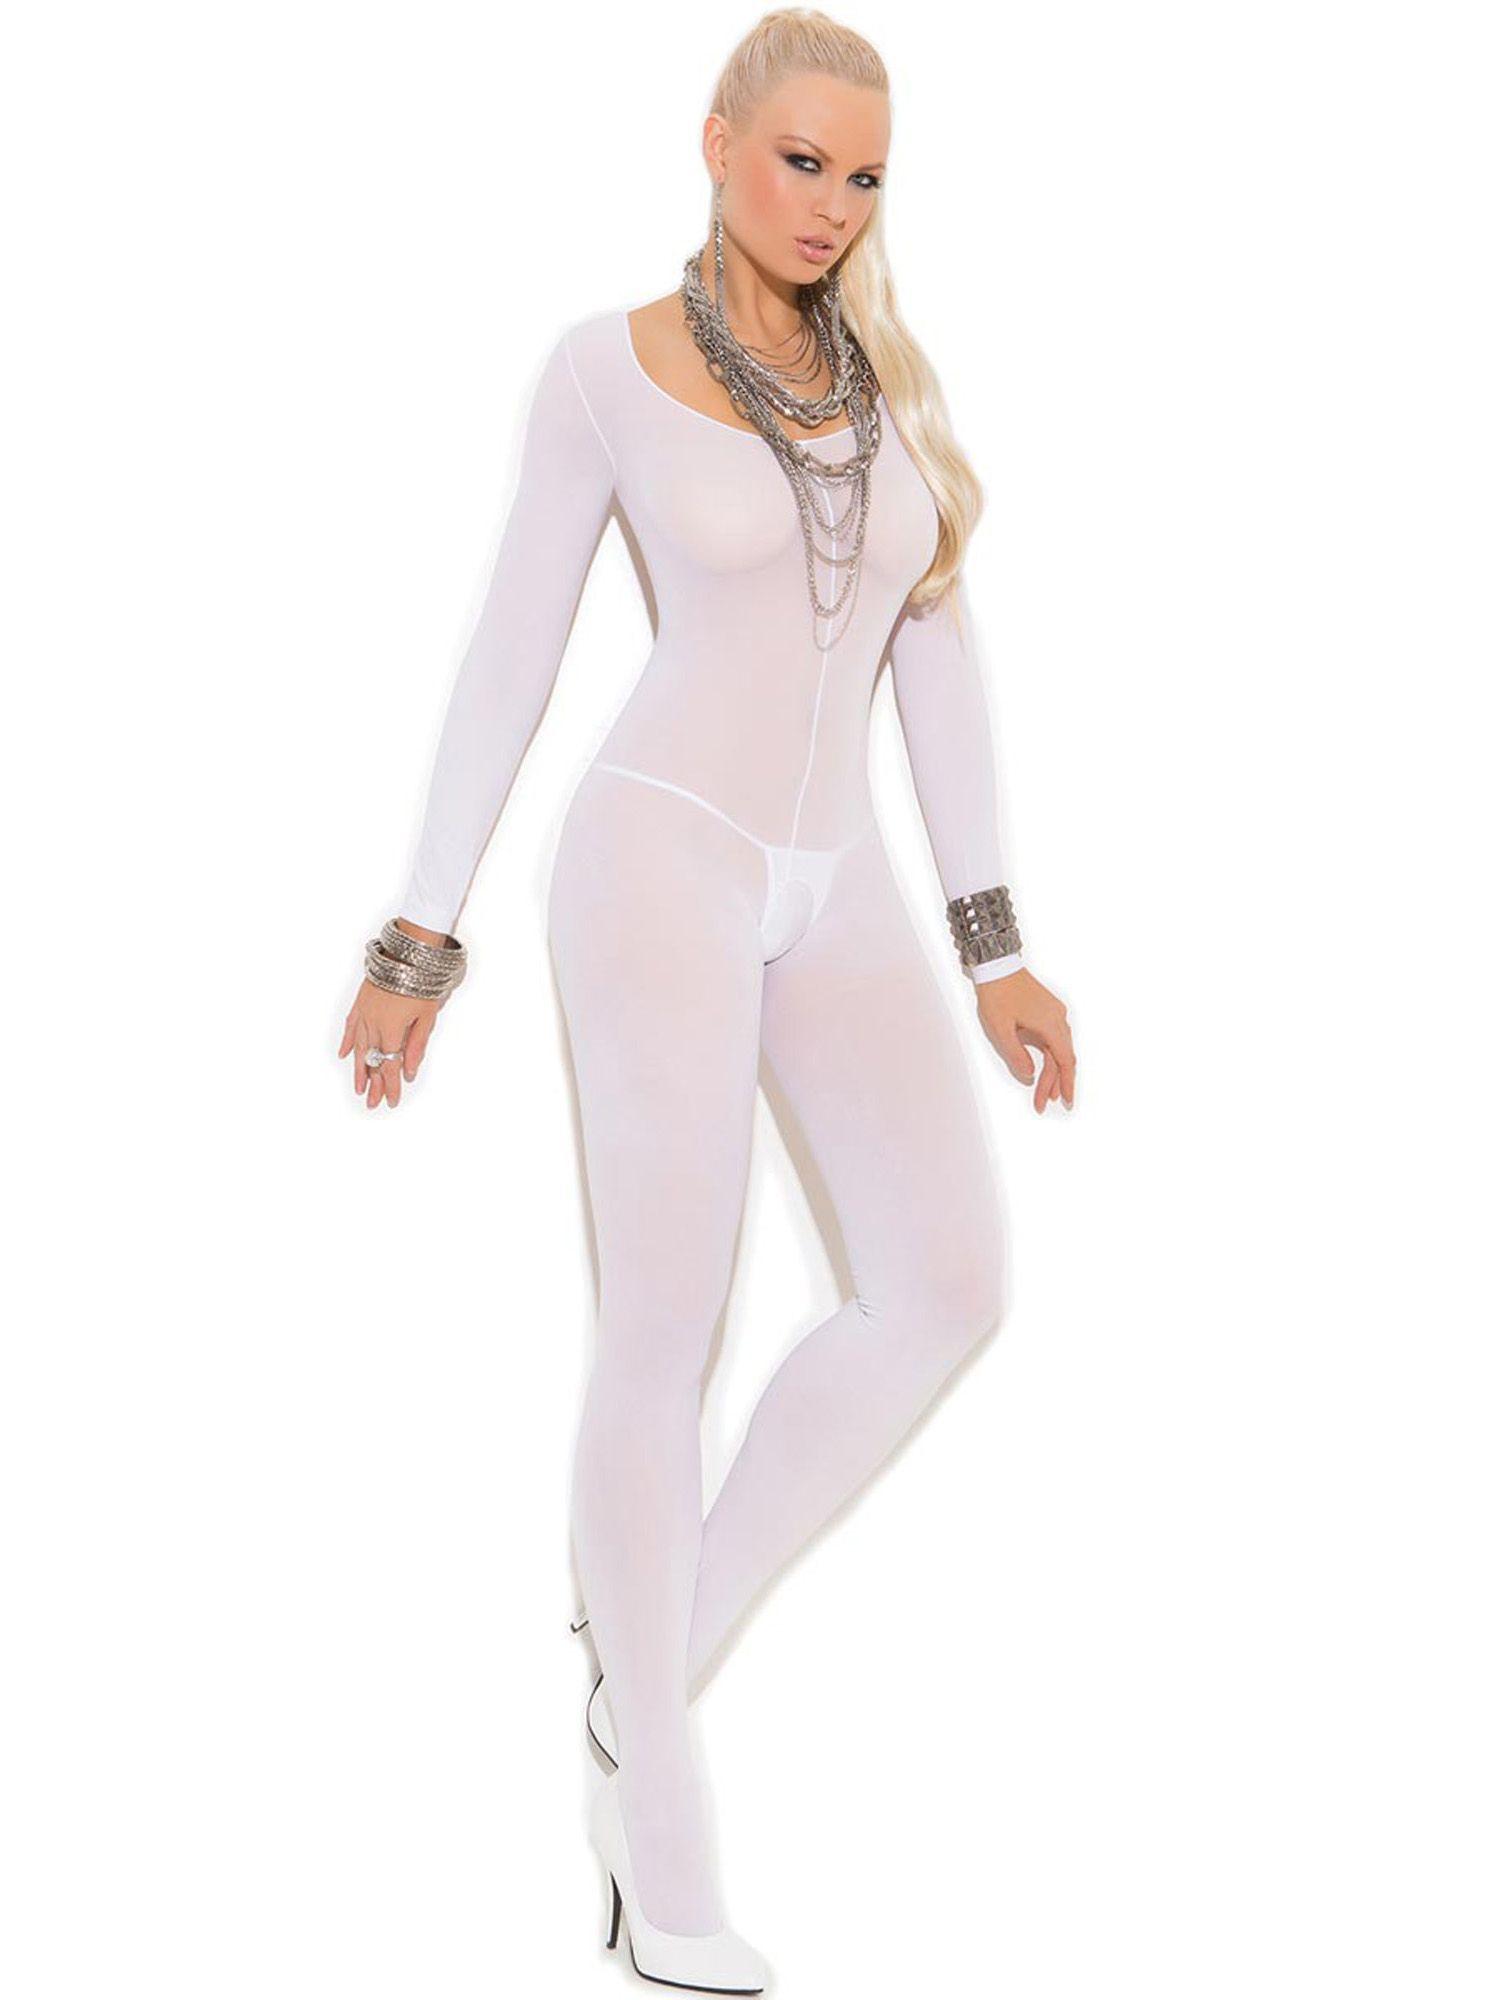 470655e7ab4 Womens Plus Size Full Figure Opaque Long Sleeve Open Crotch Bodystocking  Hosiery Figure Opaque Full